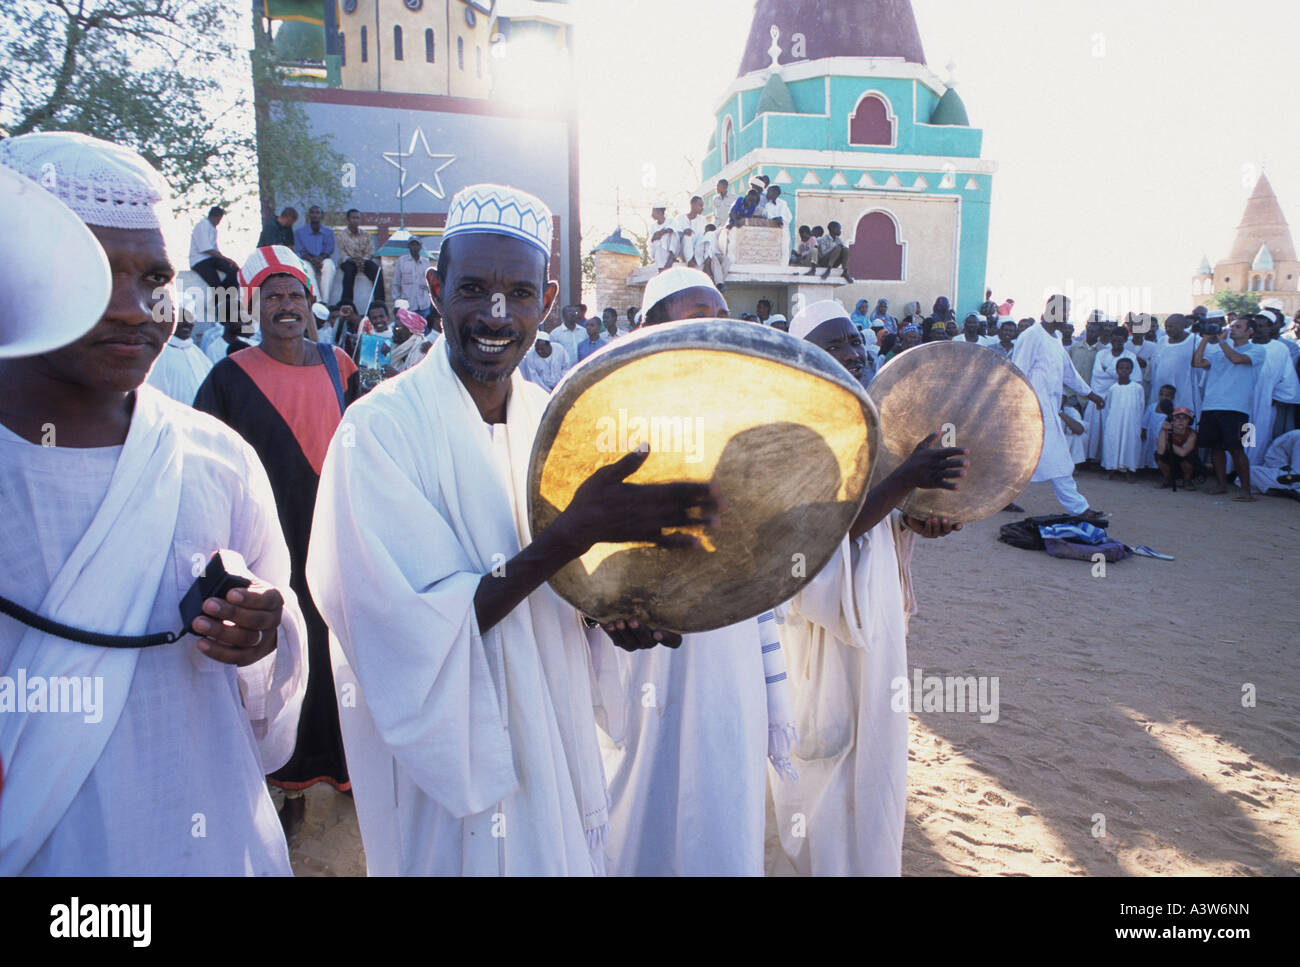 dervish omdurman sudan - Stock Image